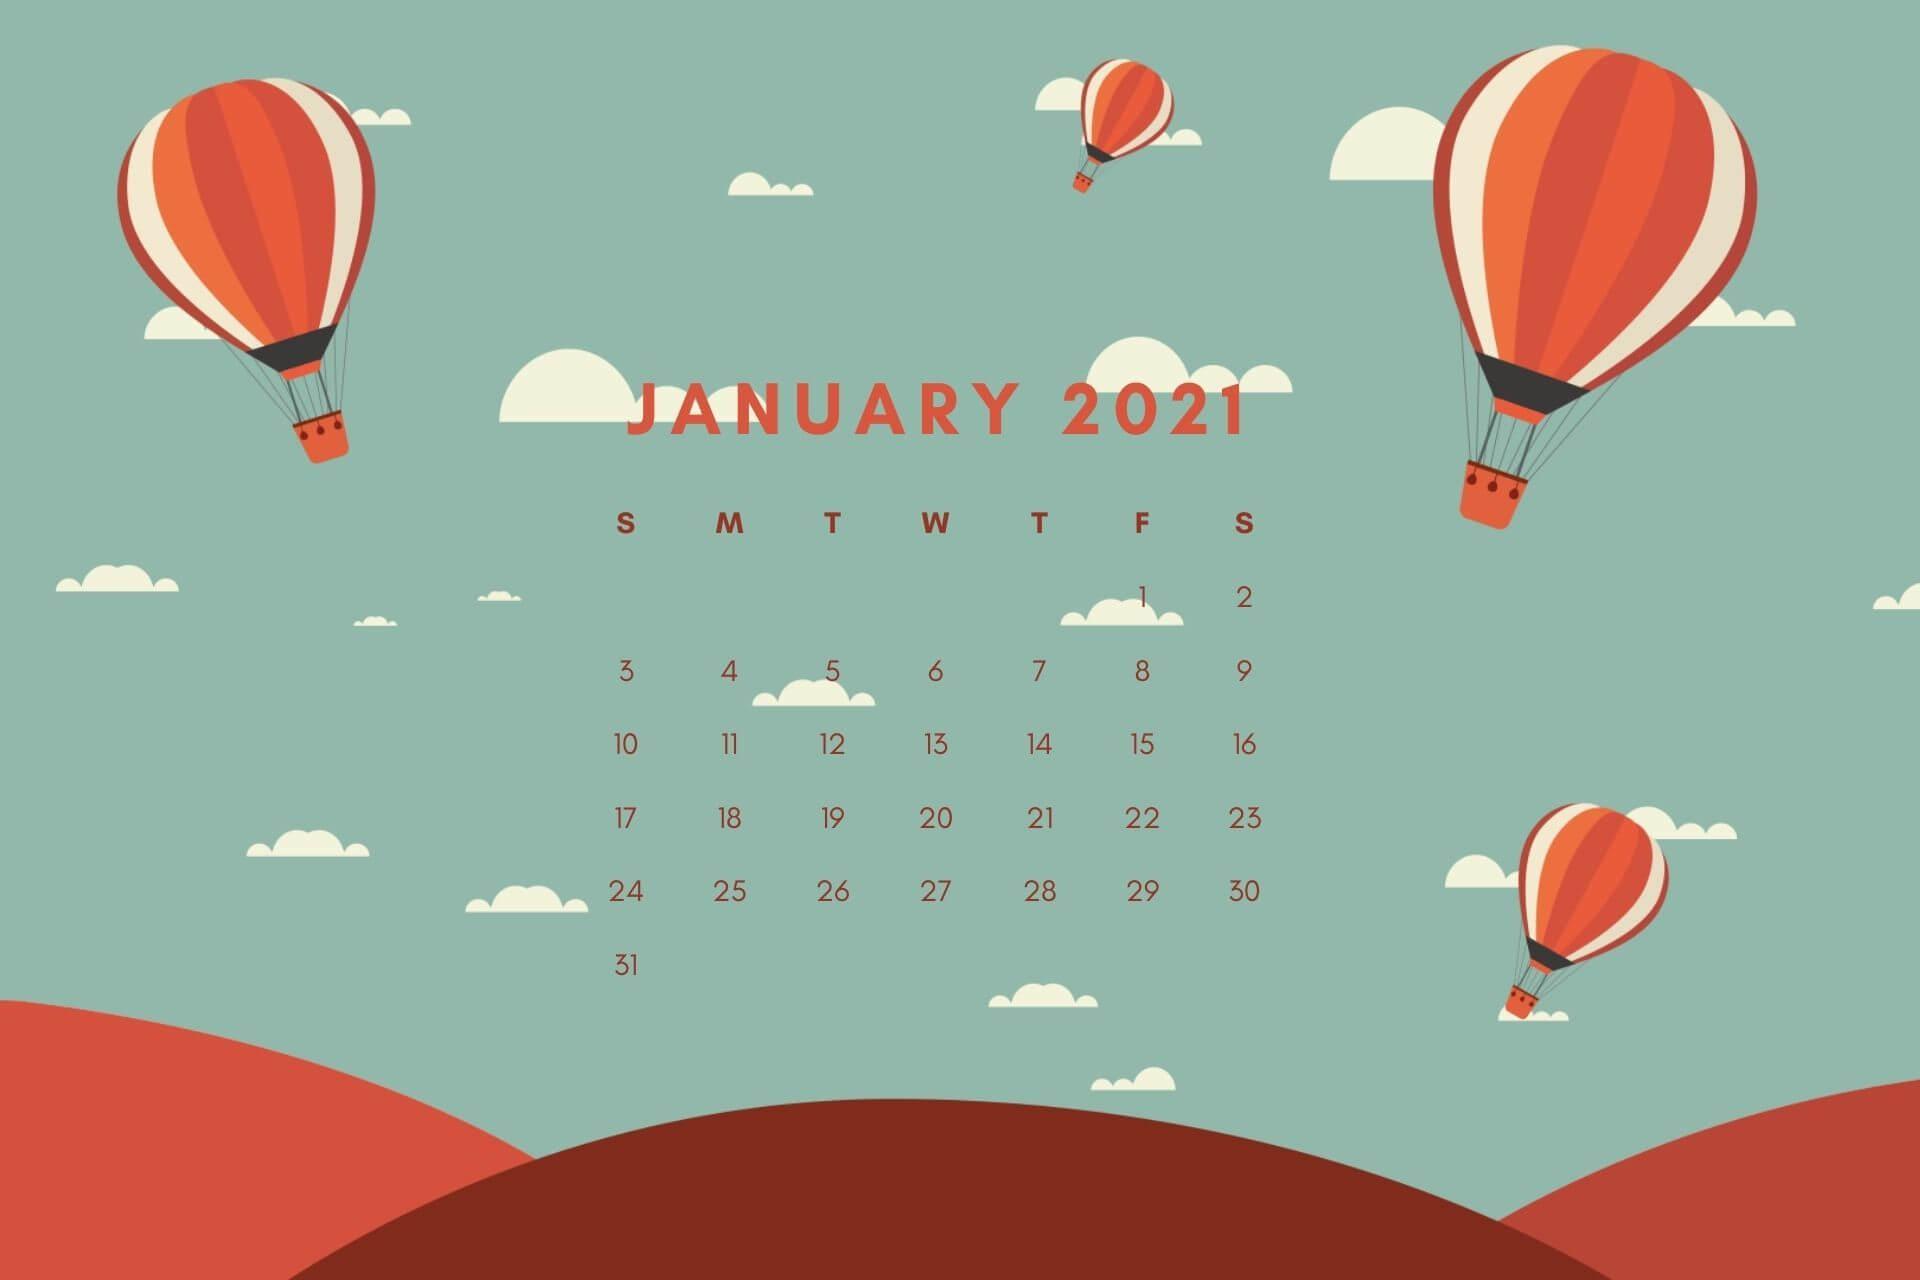 January 2021 Calendar Wallpaper